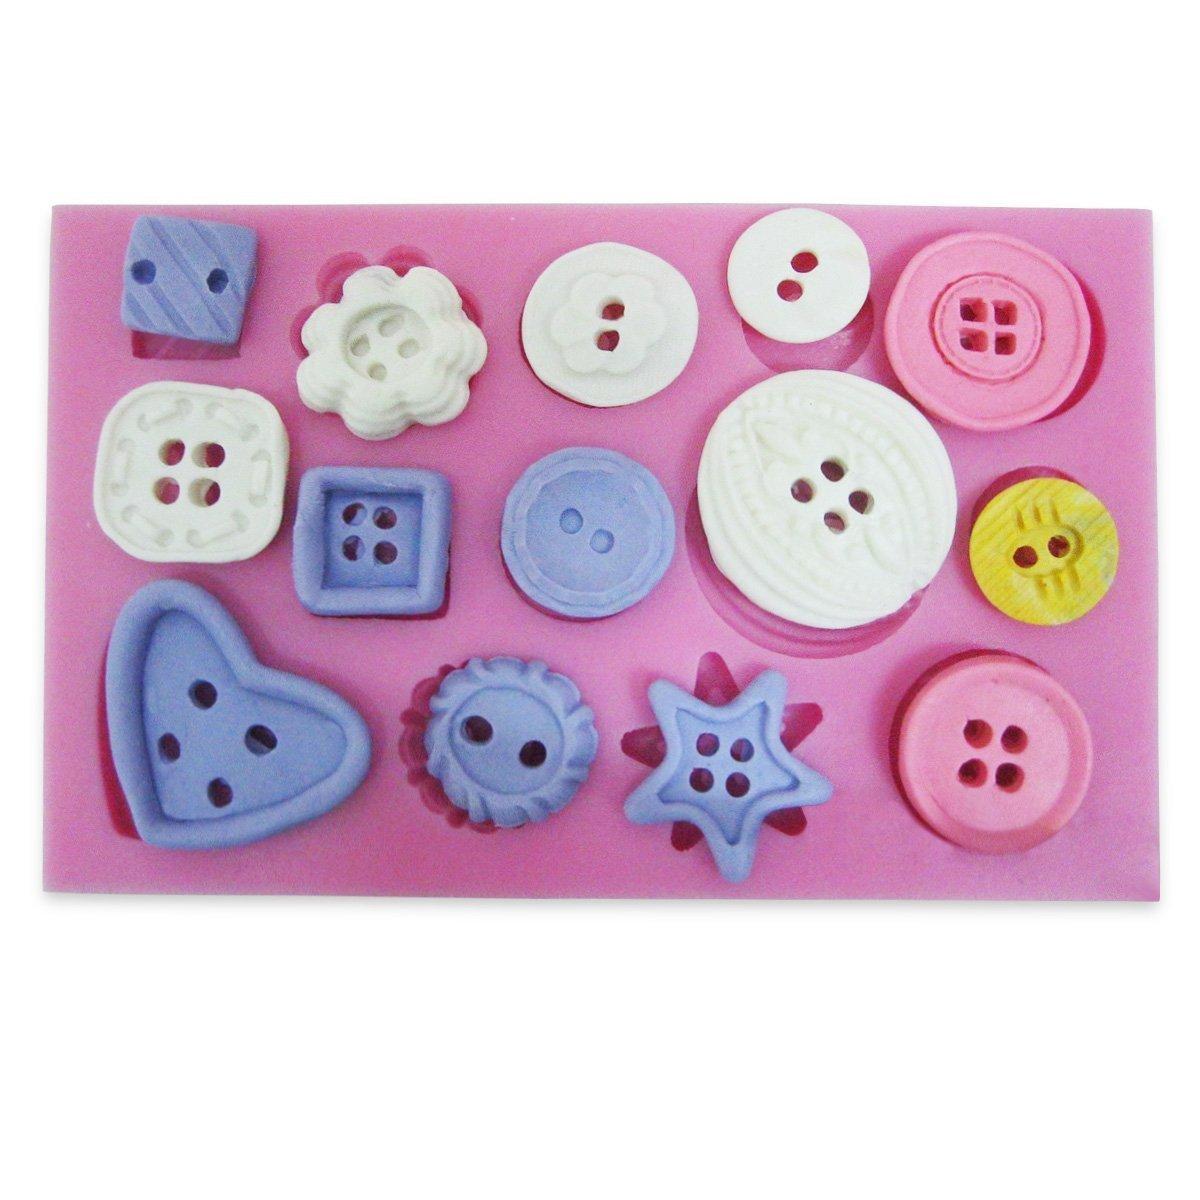 Silicone Button Pattern Mold Cake Sugar Paste Fondant Mould Kitchen Baking Tool Wanrane